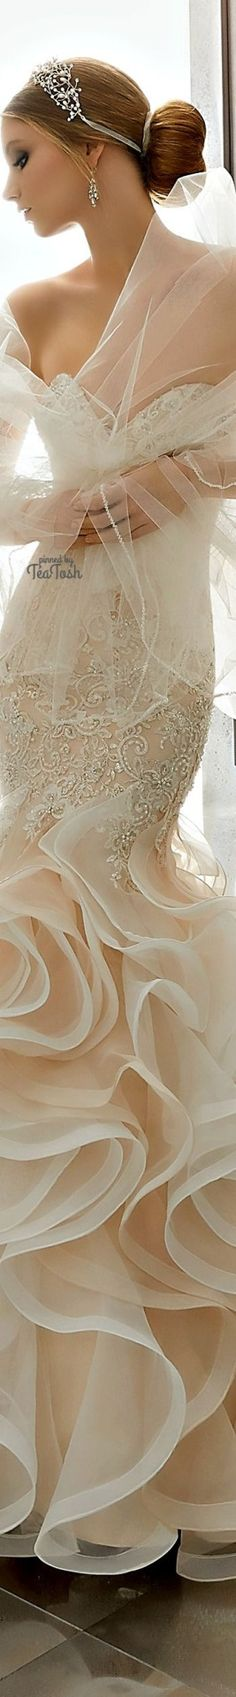 ❇Téa Tosh❇ (Front) Mirjana Wedding Dress Wedding Beauty, Dream Wedding, Wedding Day, Wedding Photos, Bridal Gowns, Wedding Gowns, Bridal Hair, My Perfect Wedding, Pearl Cream